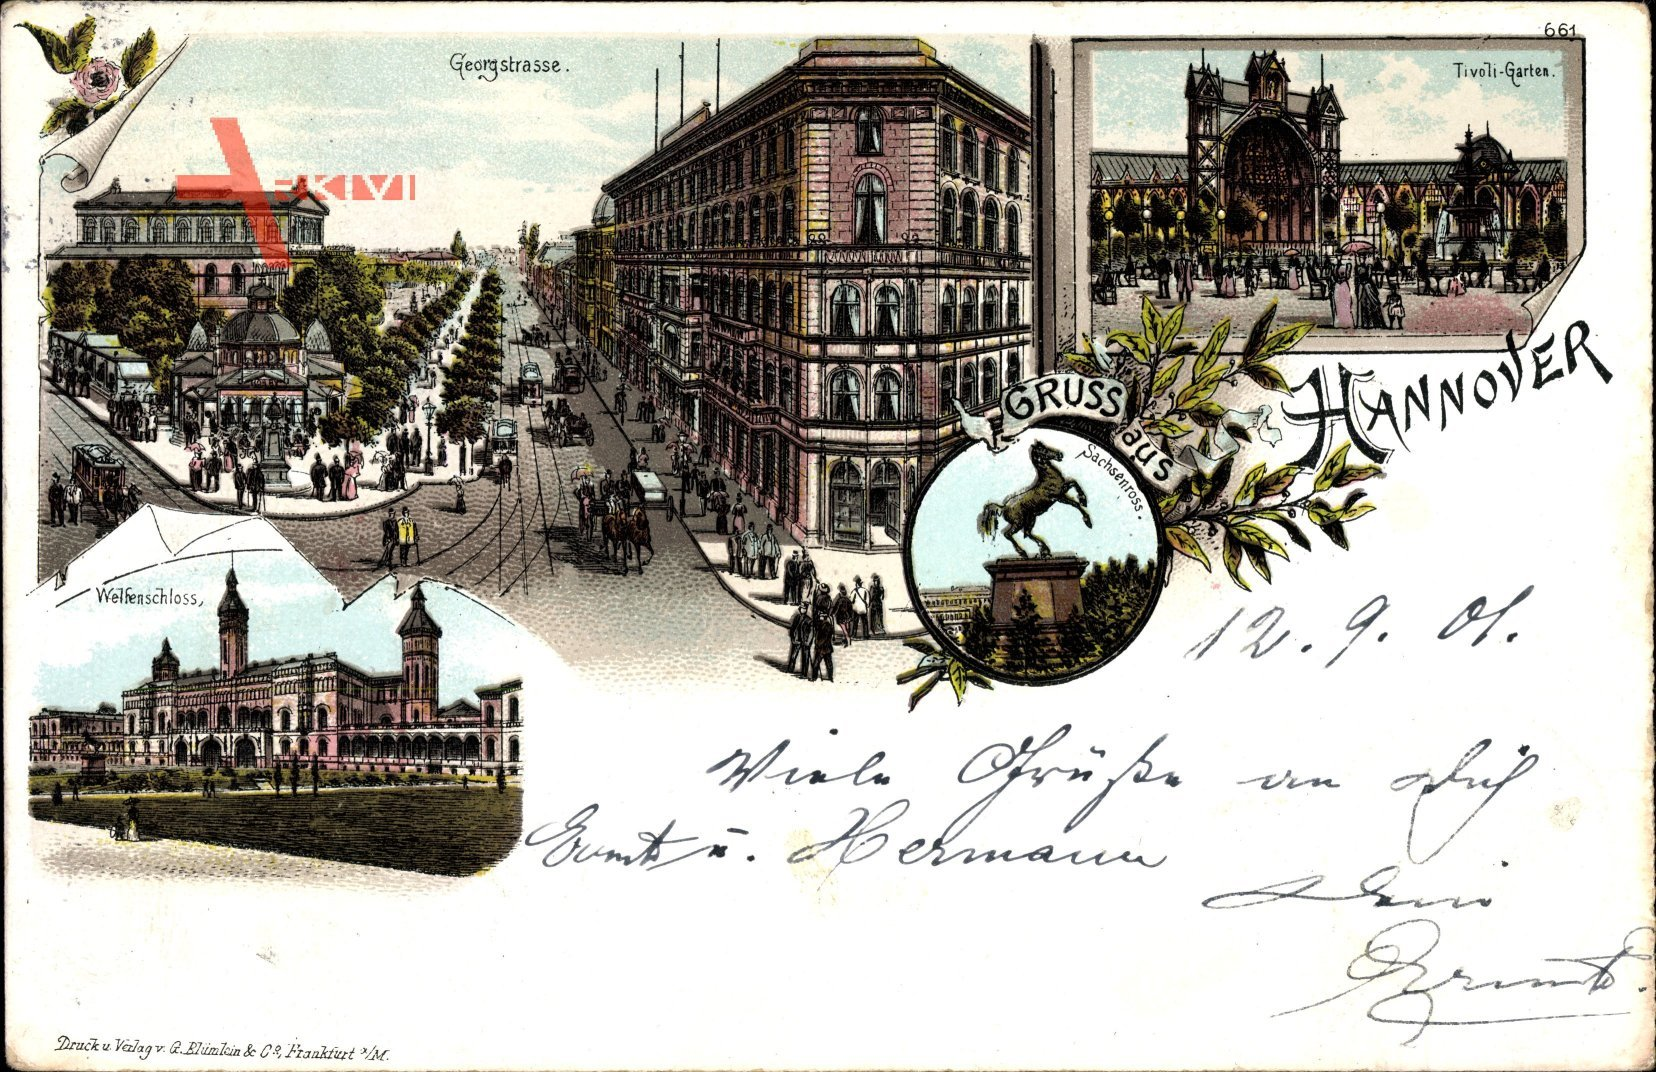 Hannover in Niedersachsen, Georgstraße, Tivoli, Welfenschloss